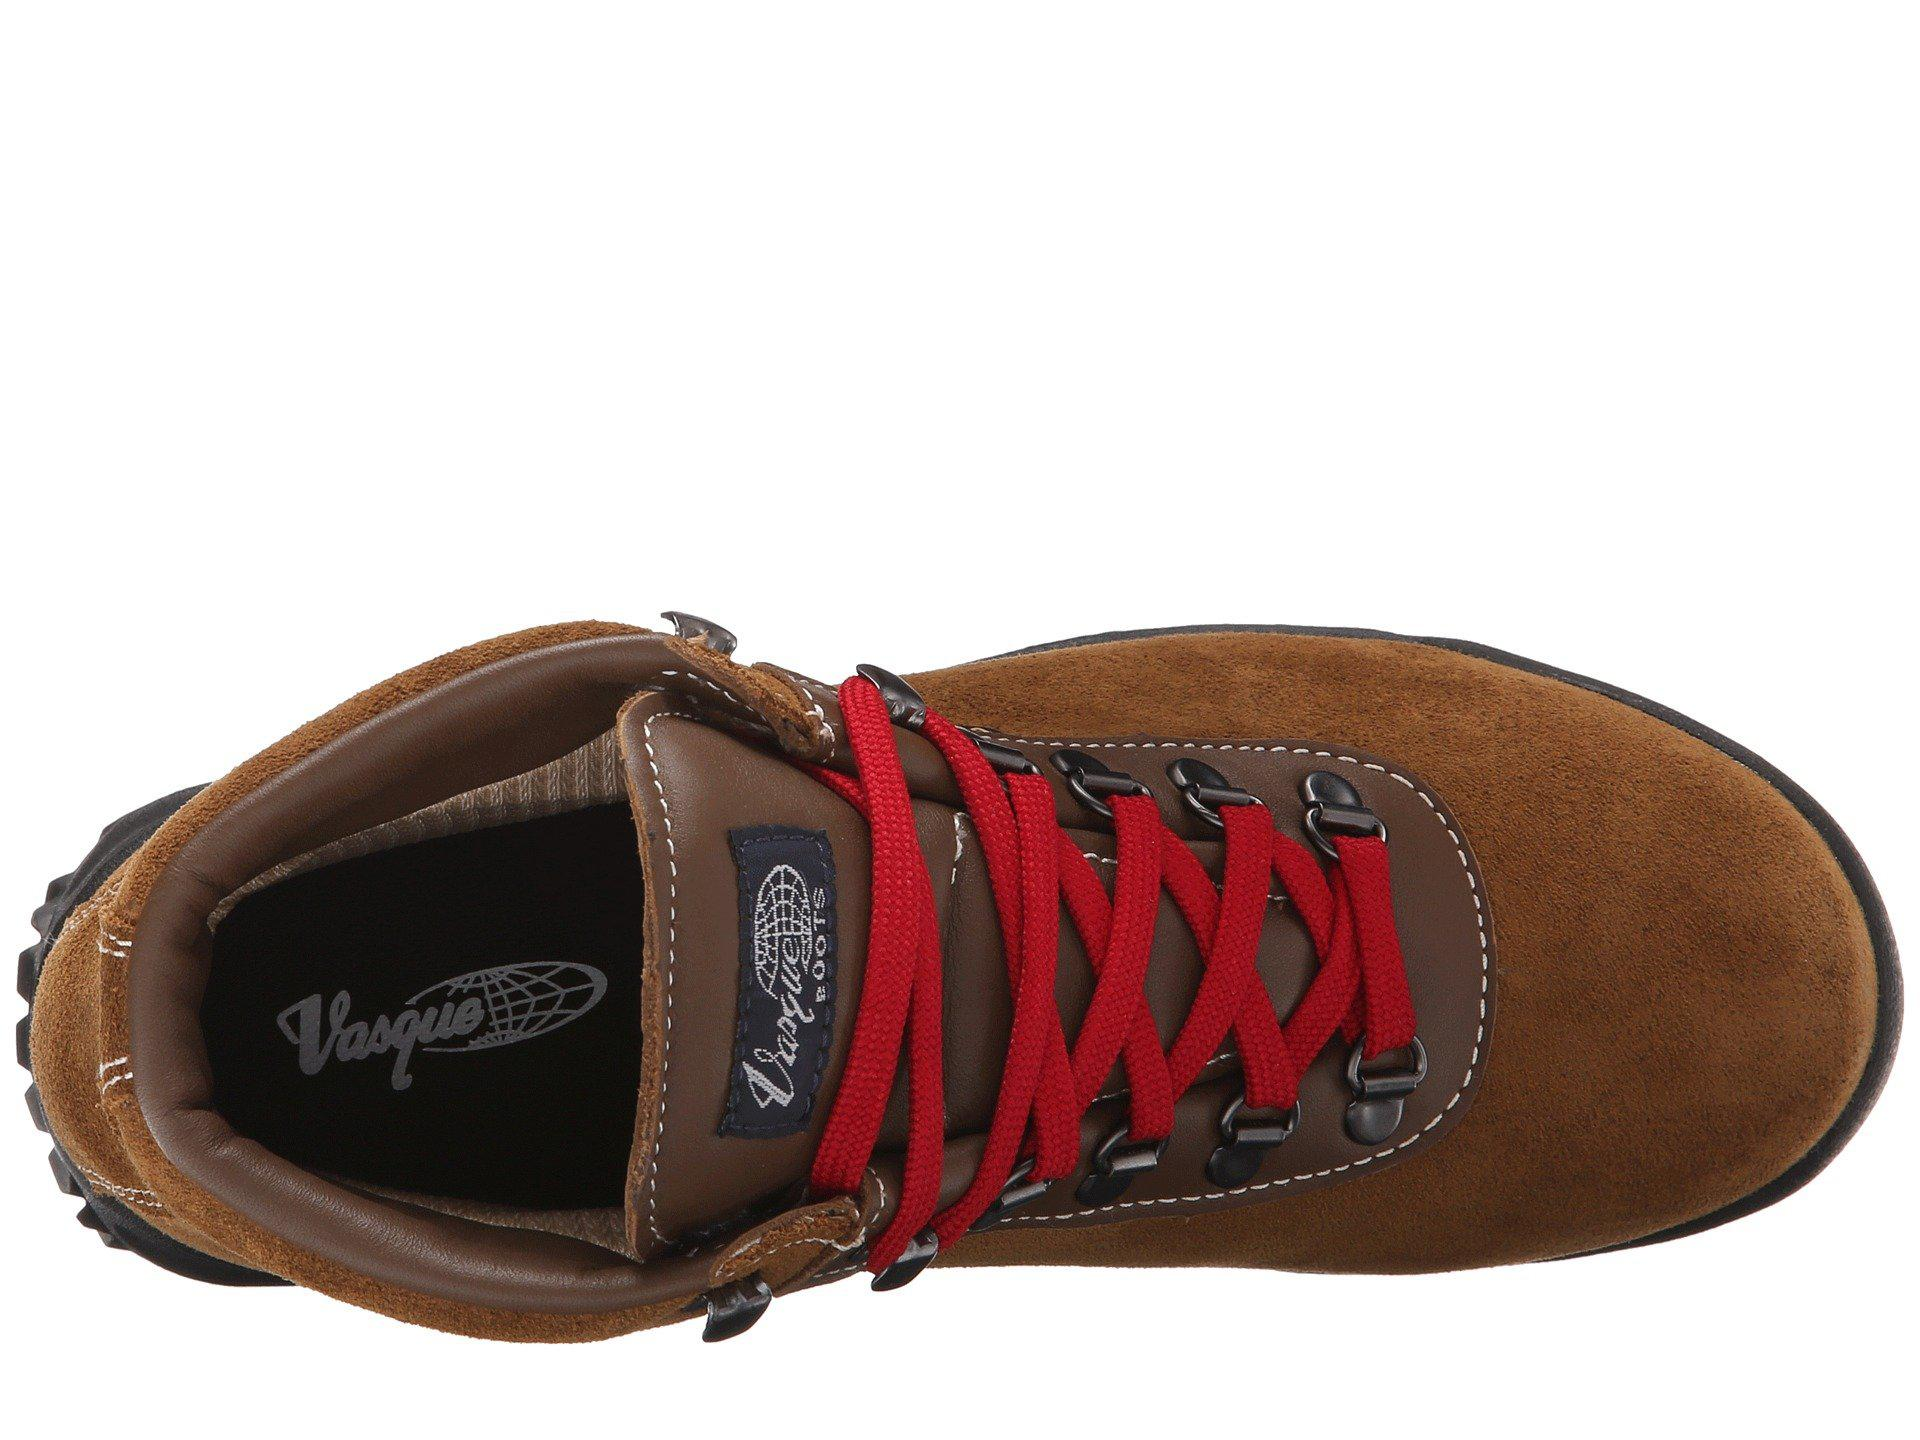 534f57aea7d Vasque Sundowner GTX Hawthorne Womens Shoes A midweight